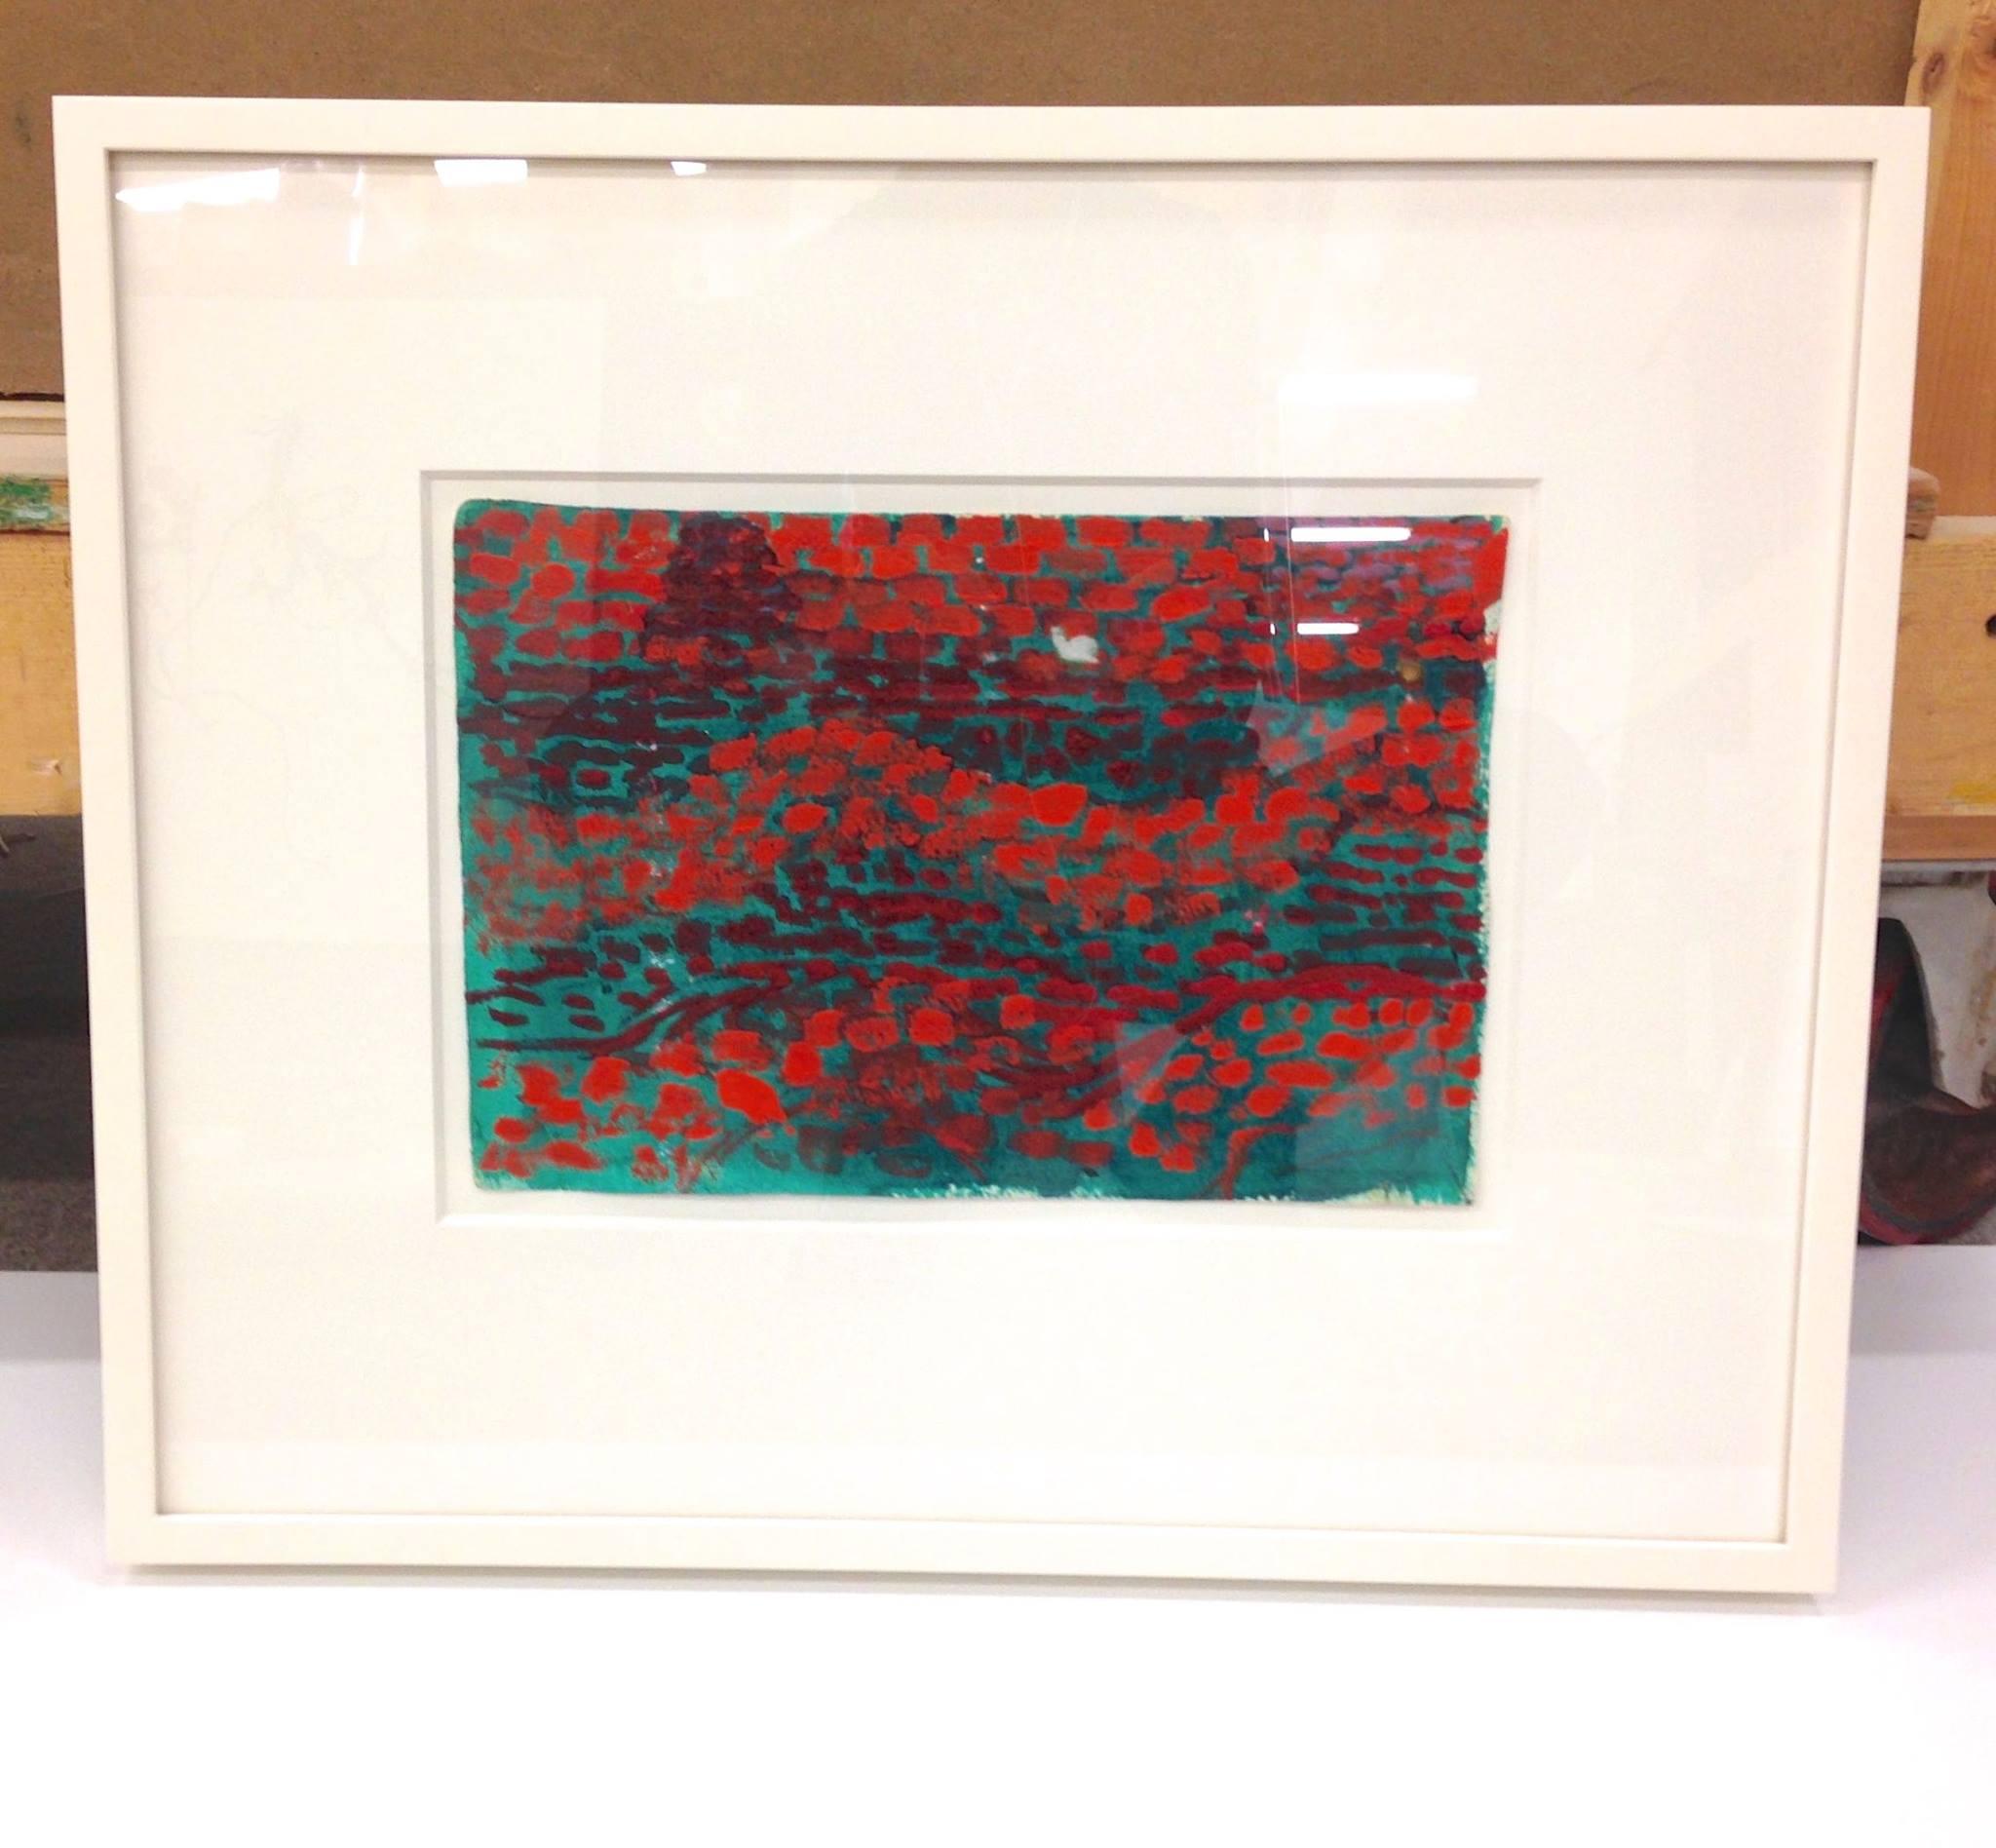 "1/2"" x 1 1/2"" Offwhite frame, 8 Ply island mat, UV Plexi"